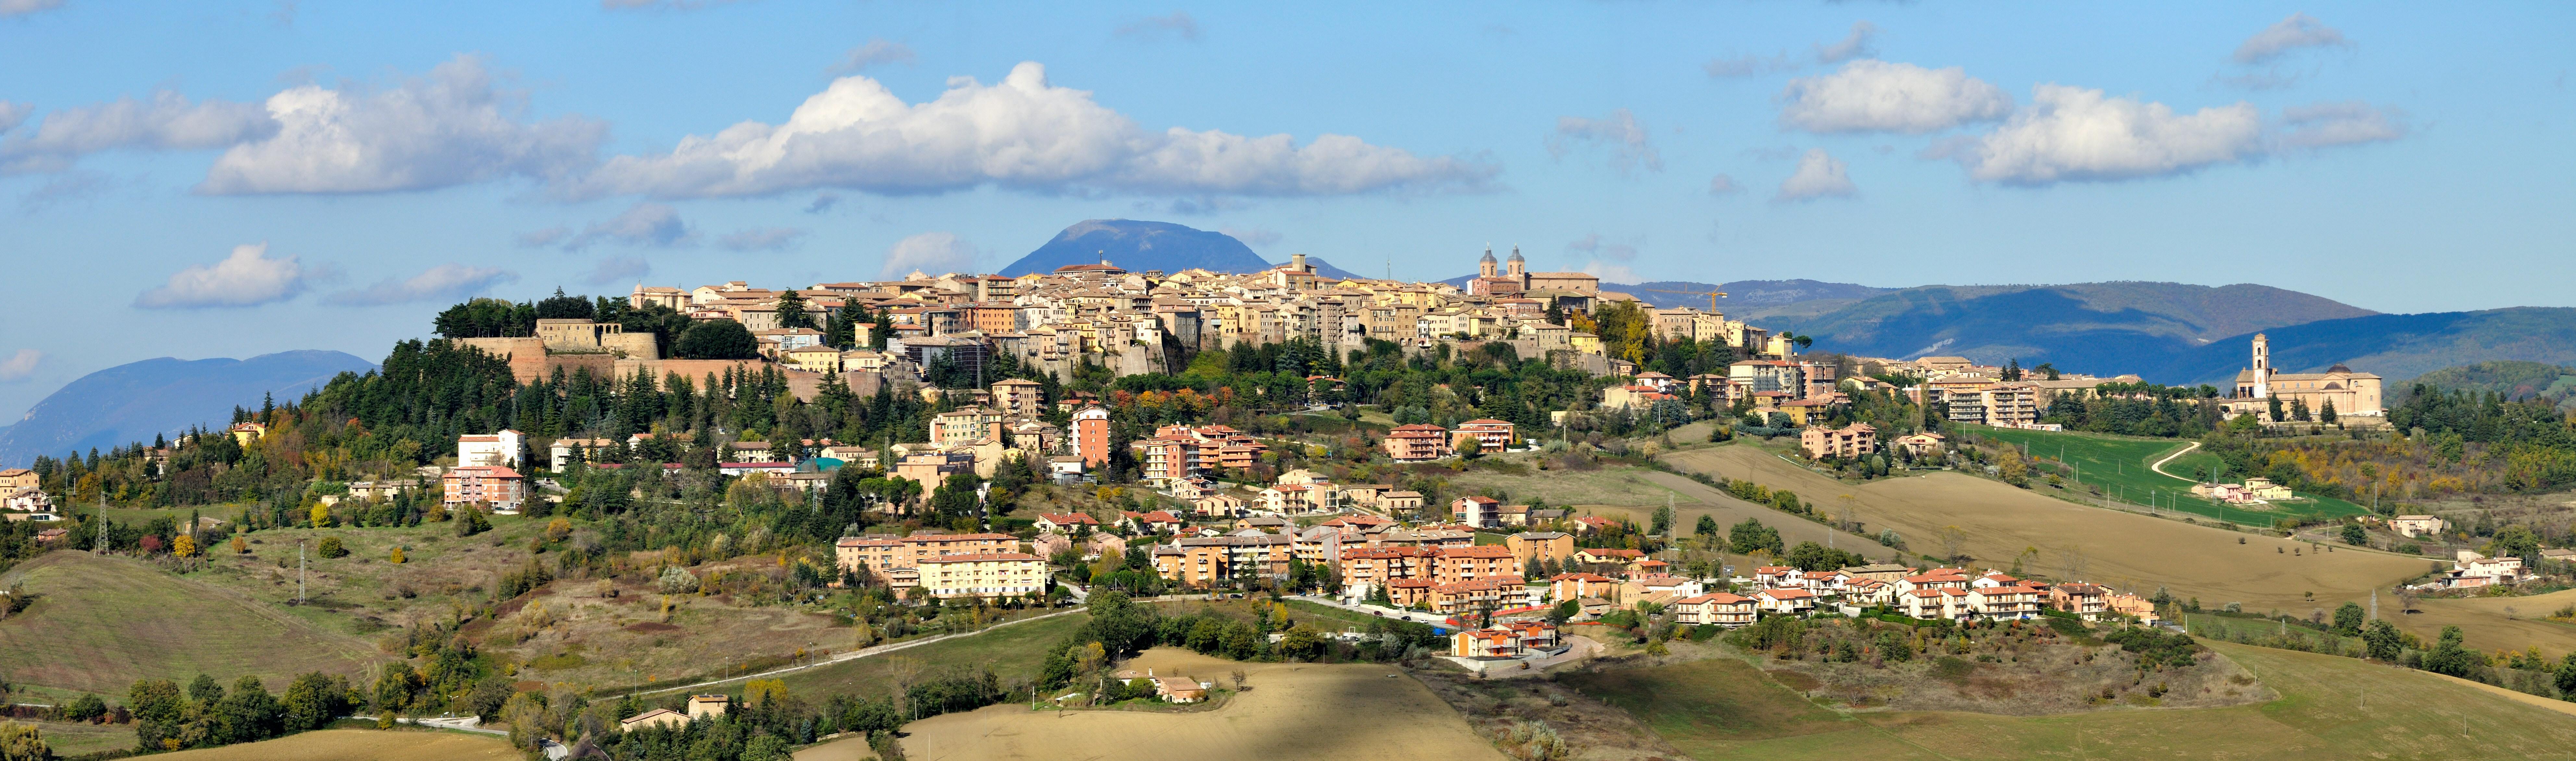 File:Camerino.panorama2.1.jpg